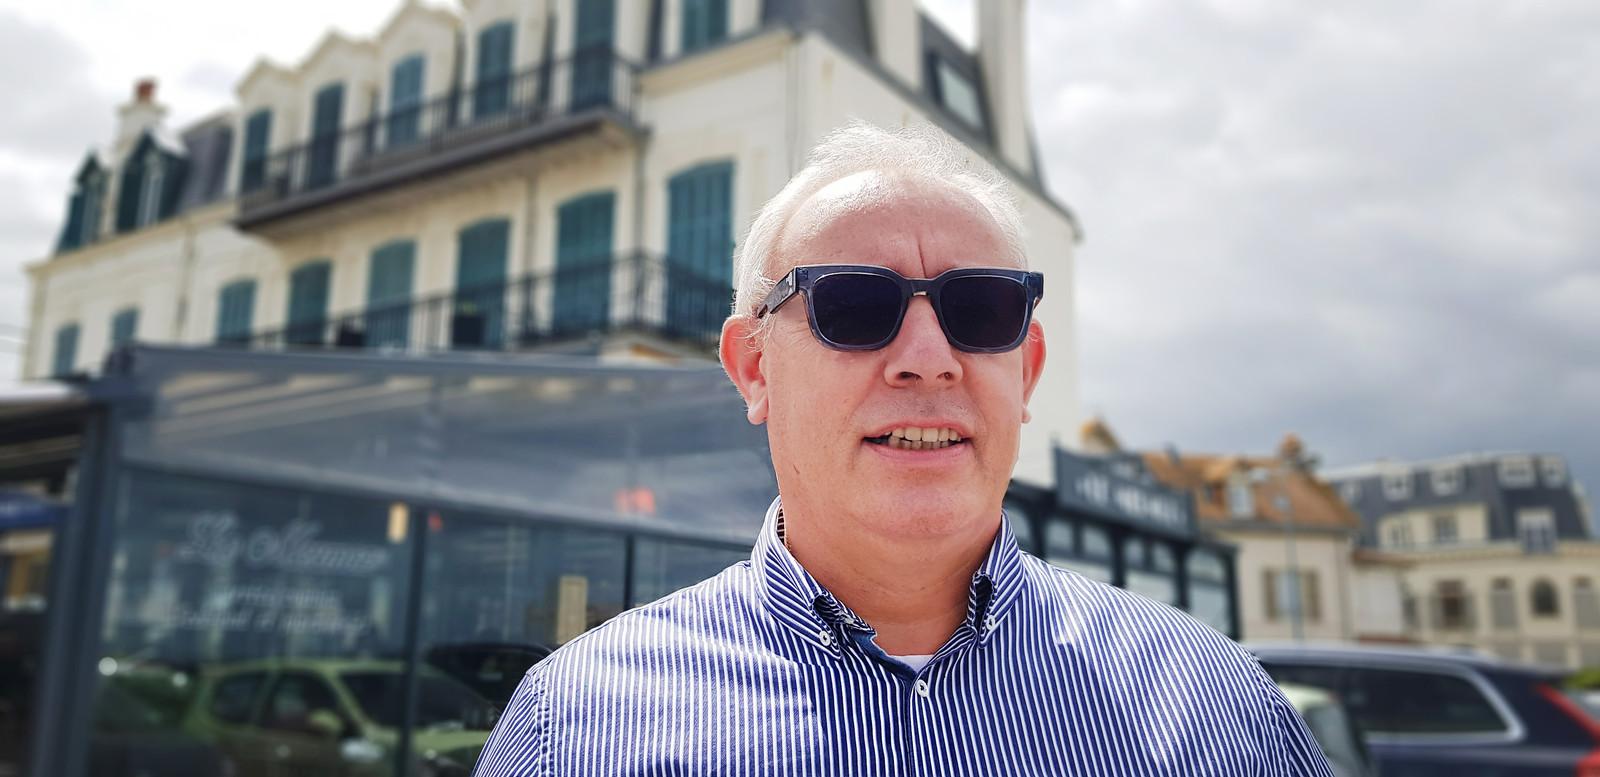 Restauranteigenaar Thierry Villey.